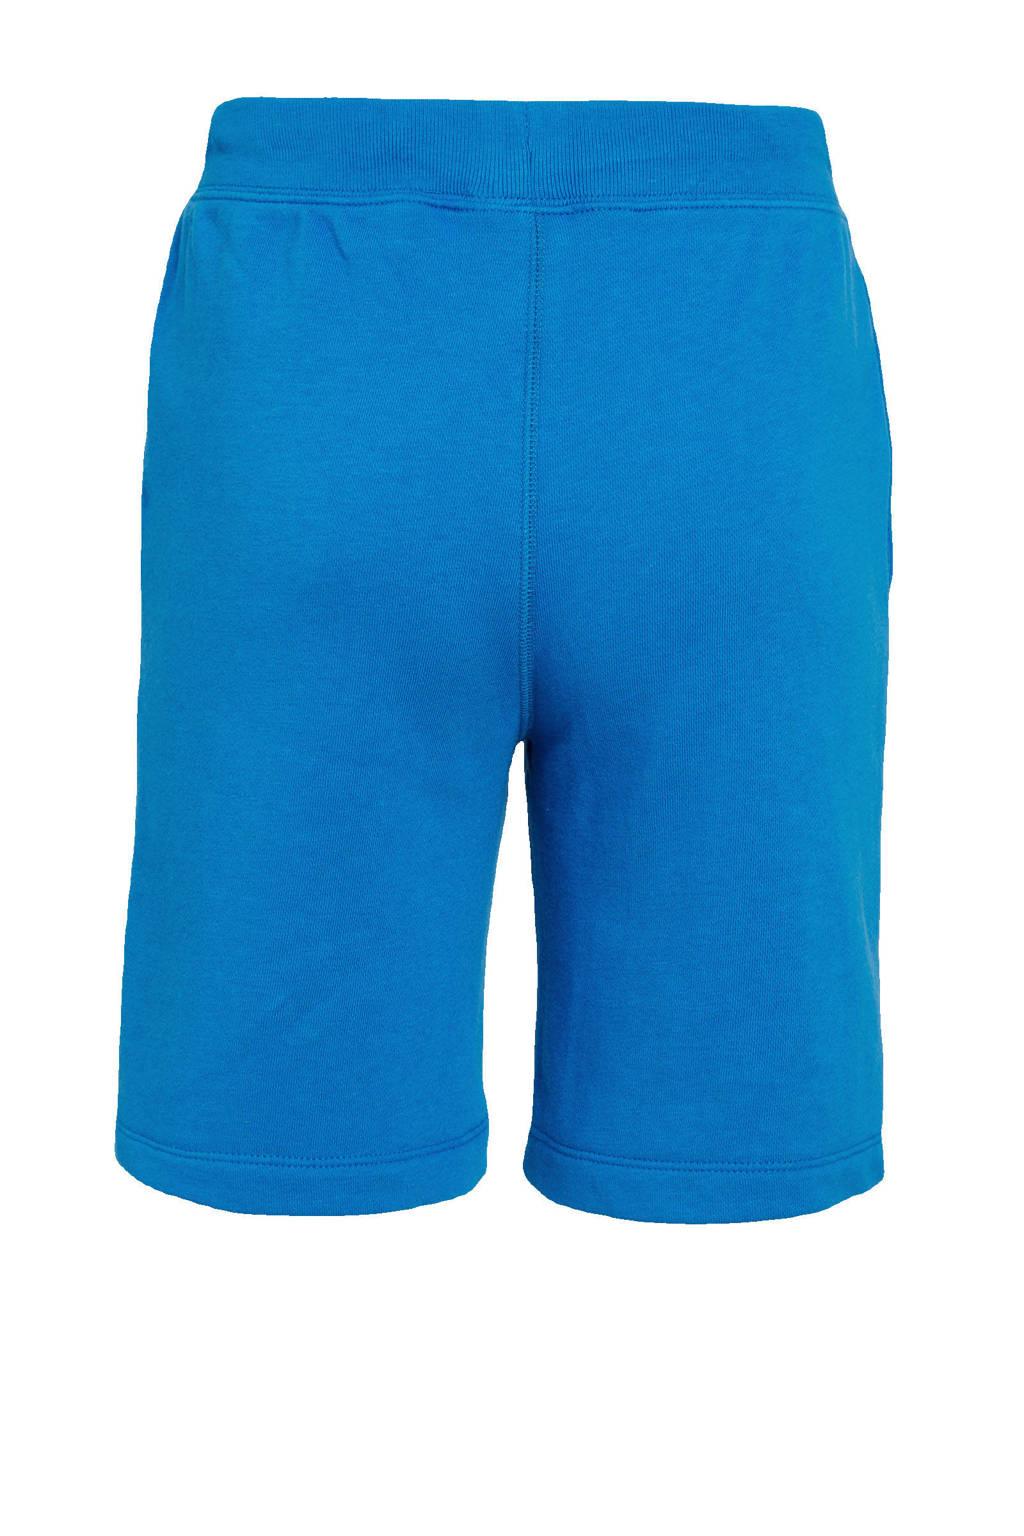 GAP regular fit sweatshort blauw, Blauw